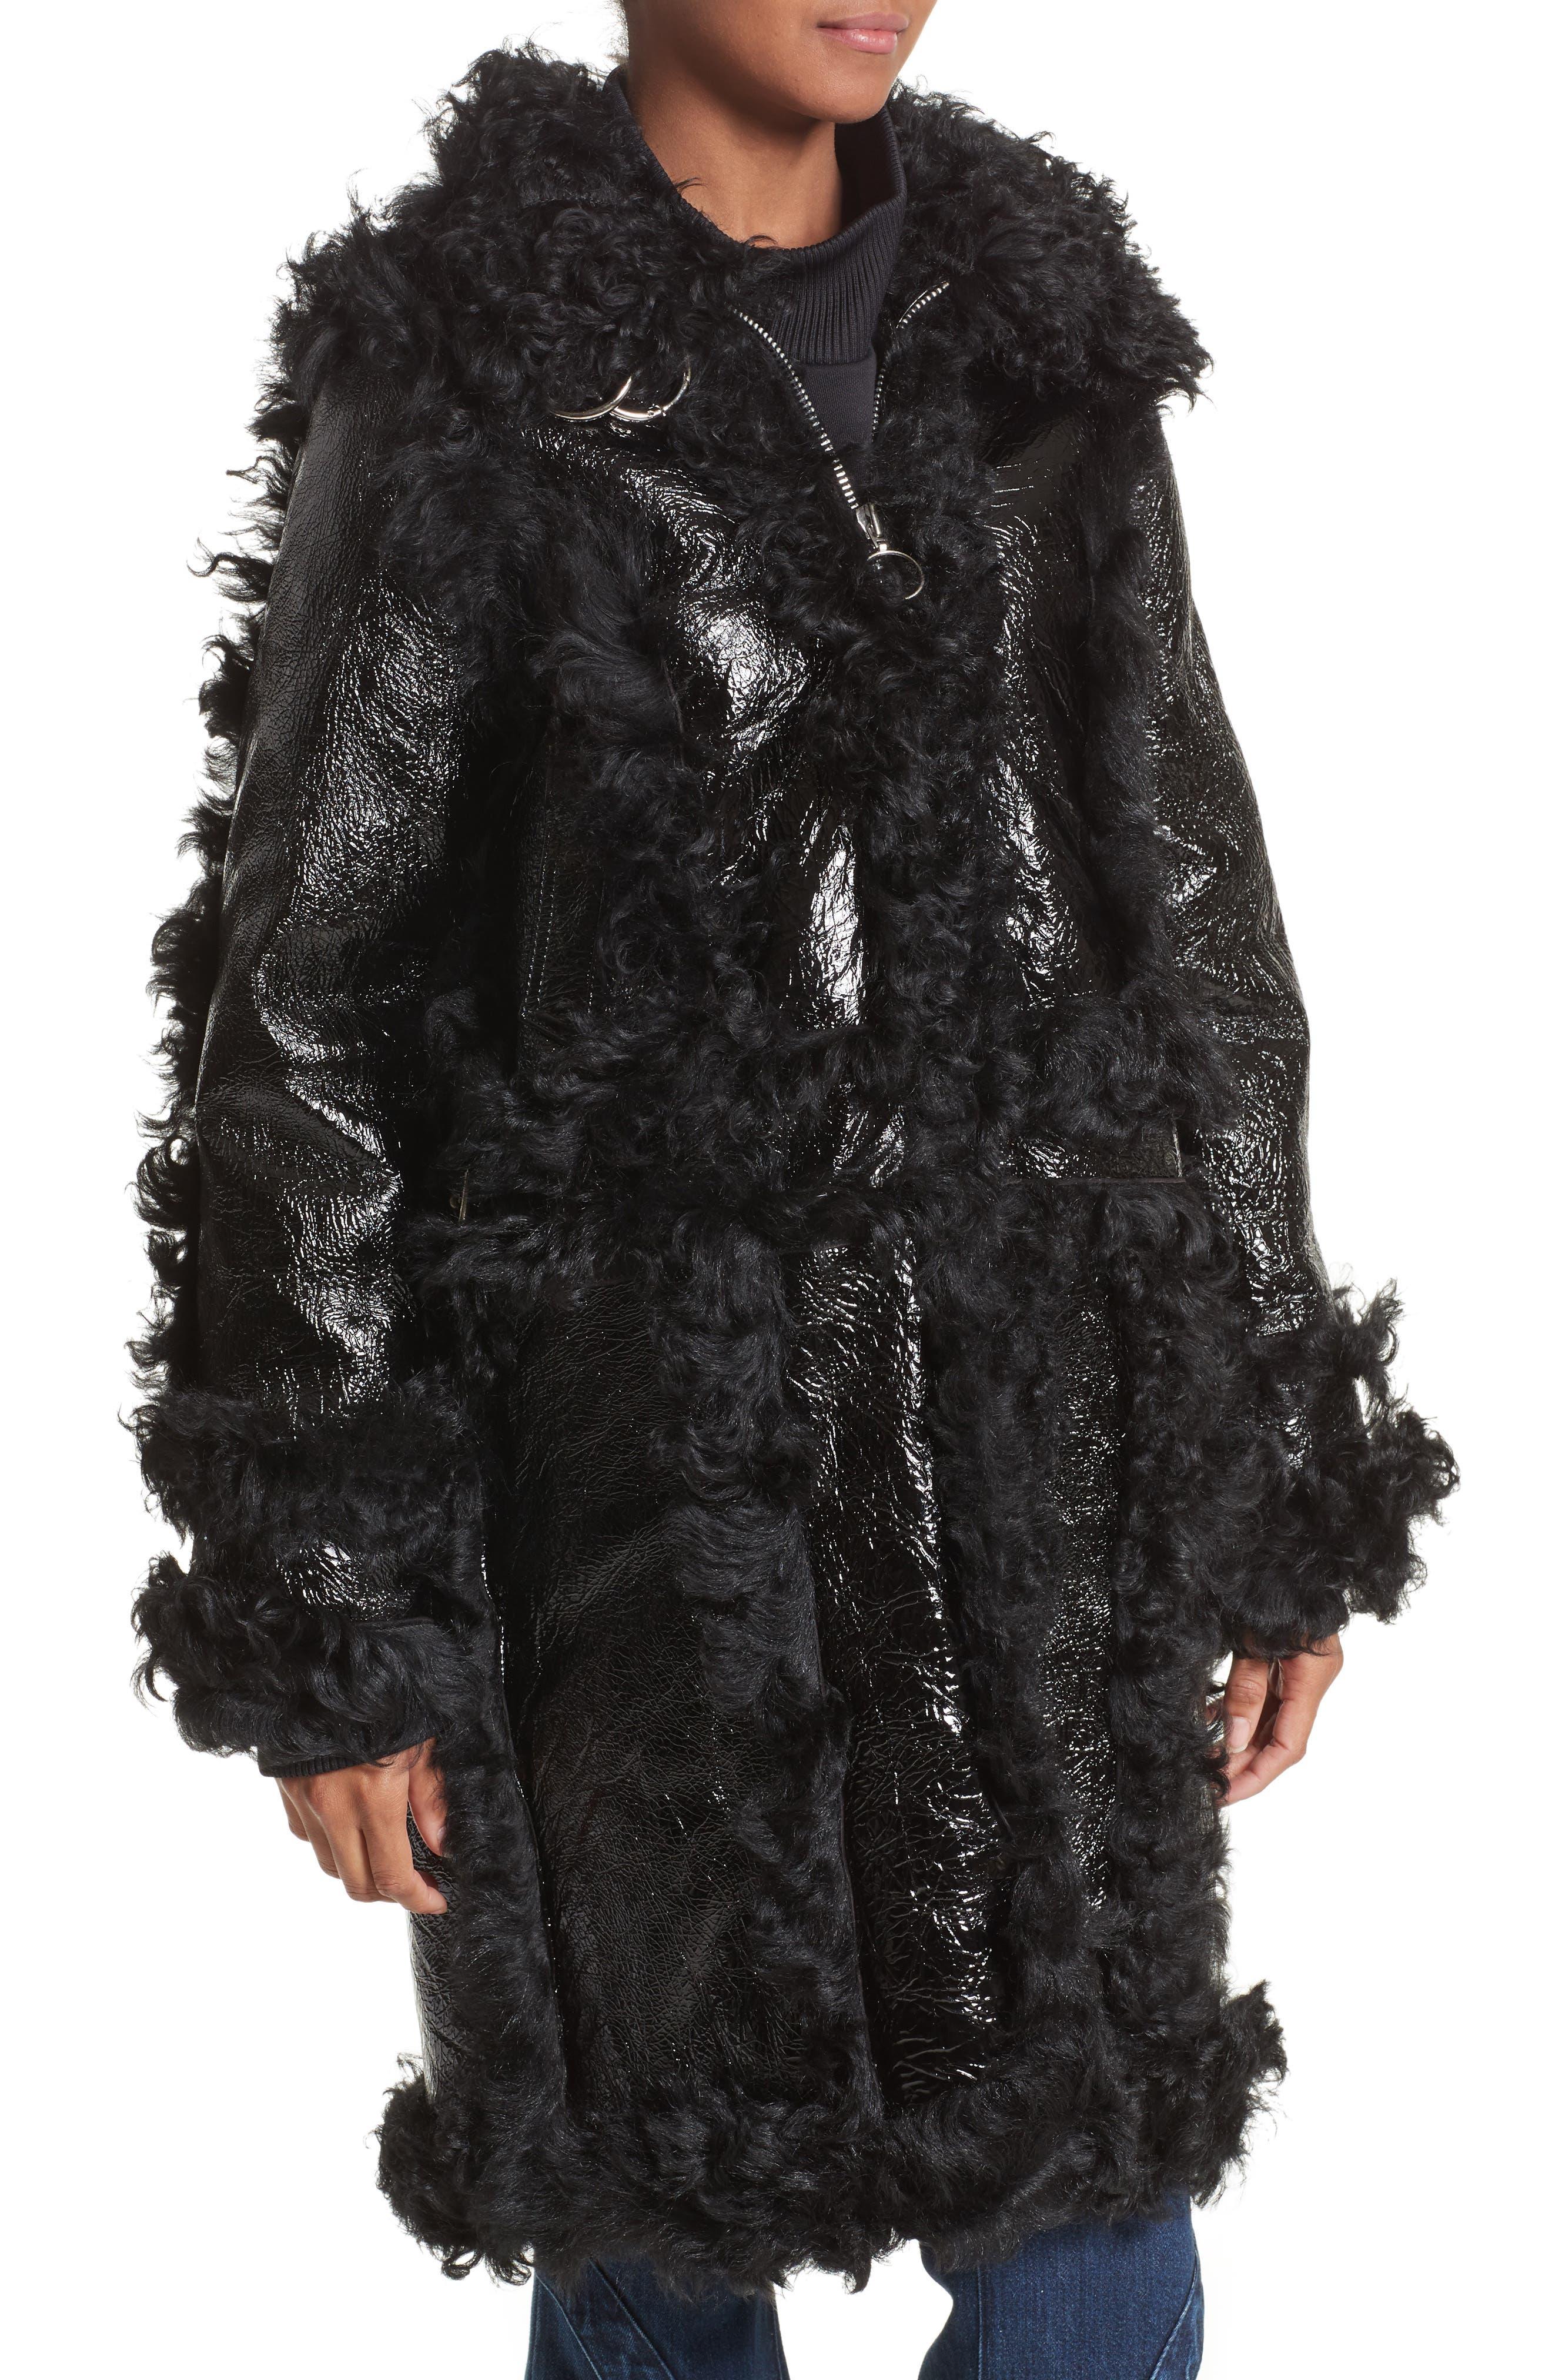 Marques'Almeida Foiled Genuine Shearling Coat,                             Alternate thumbnail 6, color,                             Black/Black